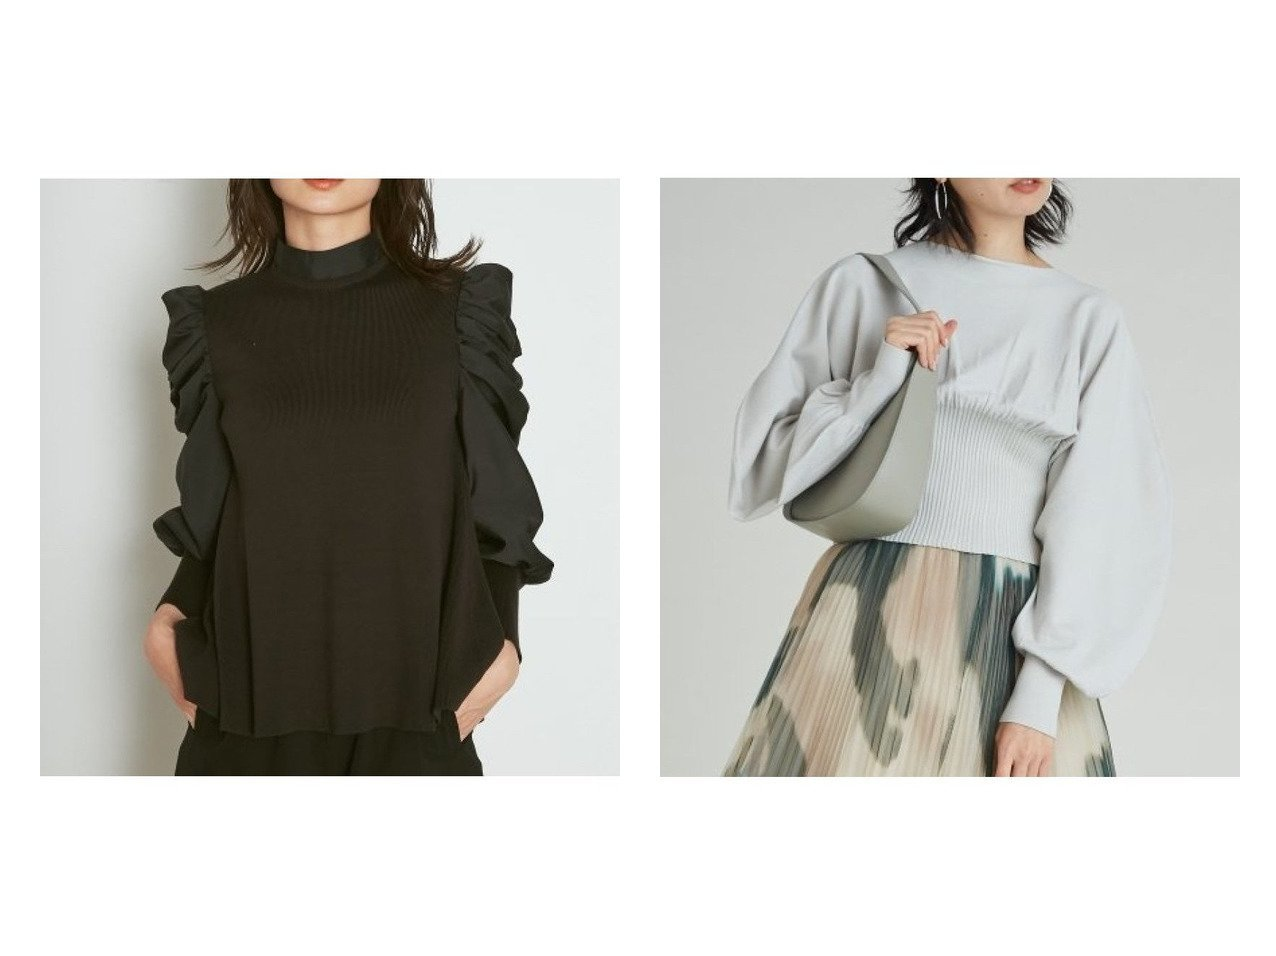 【SNIDEL/スナイデル】のスリーブボリュームフレアニット&ウエストマークパターンニットプルオーバー トップス・カットソーのおすすめ!人気、トレンド・レディースファッションの通販 おすすめで人気の流行・トレンド、ファッションの通販商品 メンズファッション・キッズファッション・インテリア・家具・レディースファッション・服の通販 founy(ファニー) https://founy.com/ ファッション Fashion レディースファッション WOMEN トップス Tops Tshirt ニット Knit Tops プルオーバー Pullover ギャザー スタンド スリーブ チュニック トレンド フィット フェミニン フレア ラベンダー ワイド 再入荷 Restock/Back in Stock/Re Arrival NEW・新作・新着・新入荷 New Arrivals なめらか ショート シンプル バランス フォルム ボトム |ID:crp329100000012004